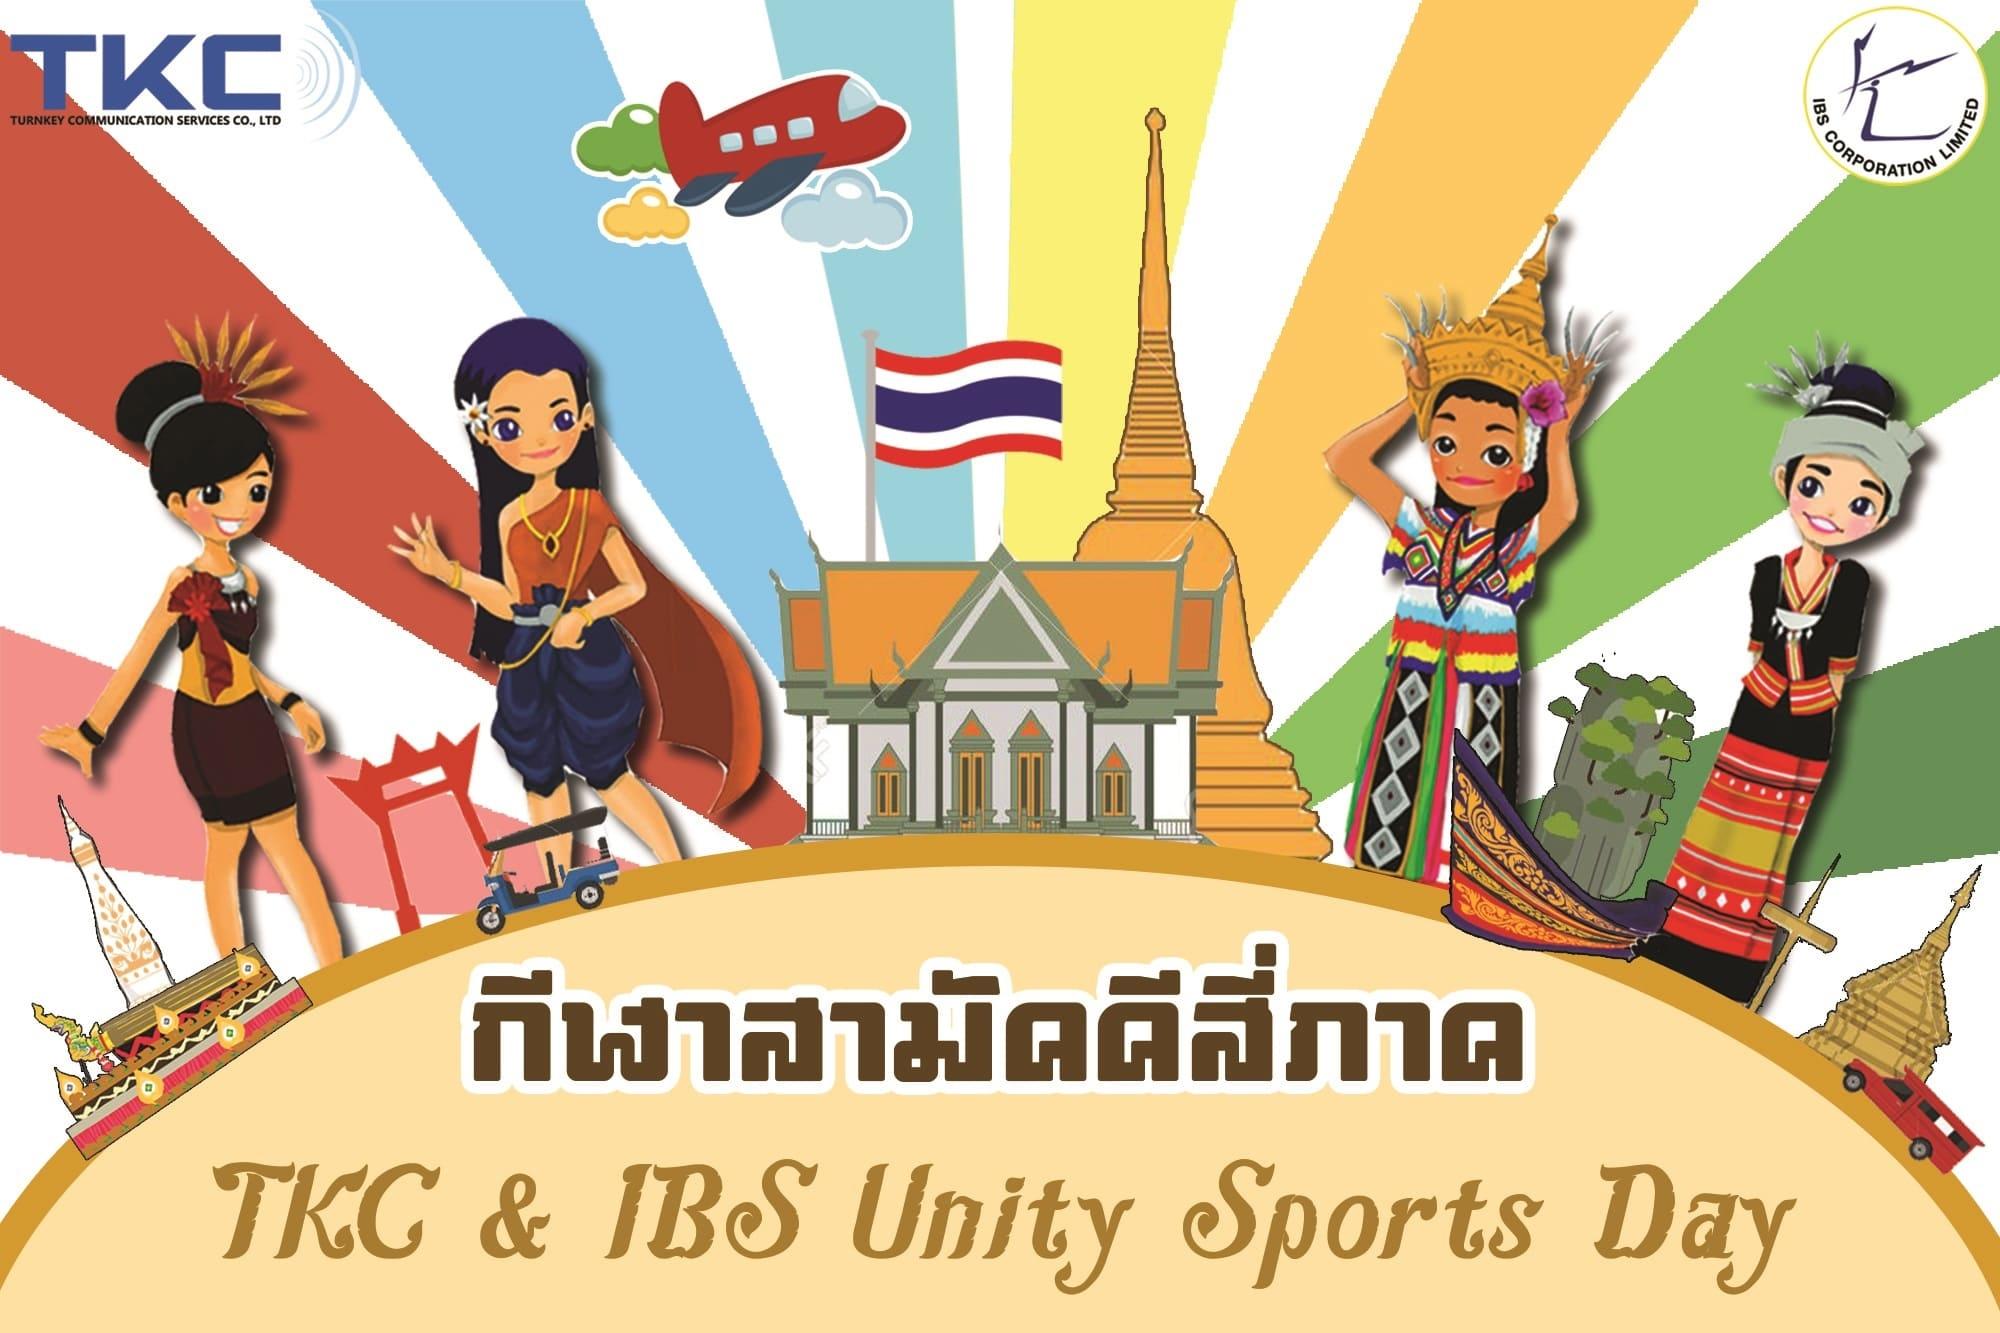 TKS & IBS Unity Sports Day